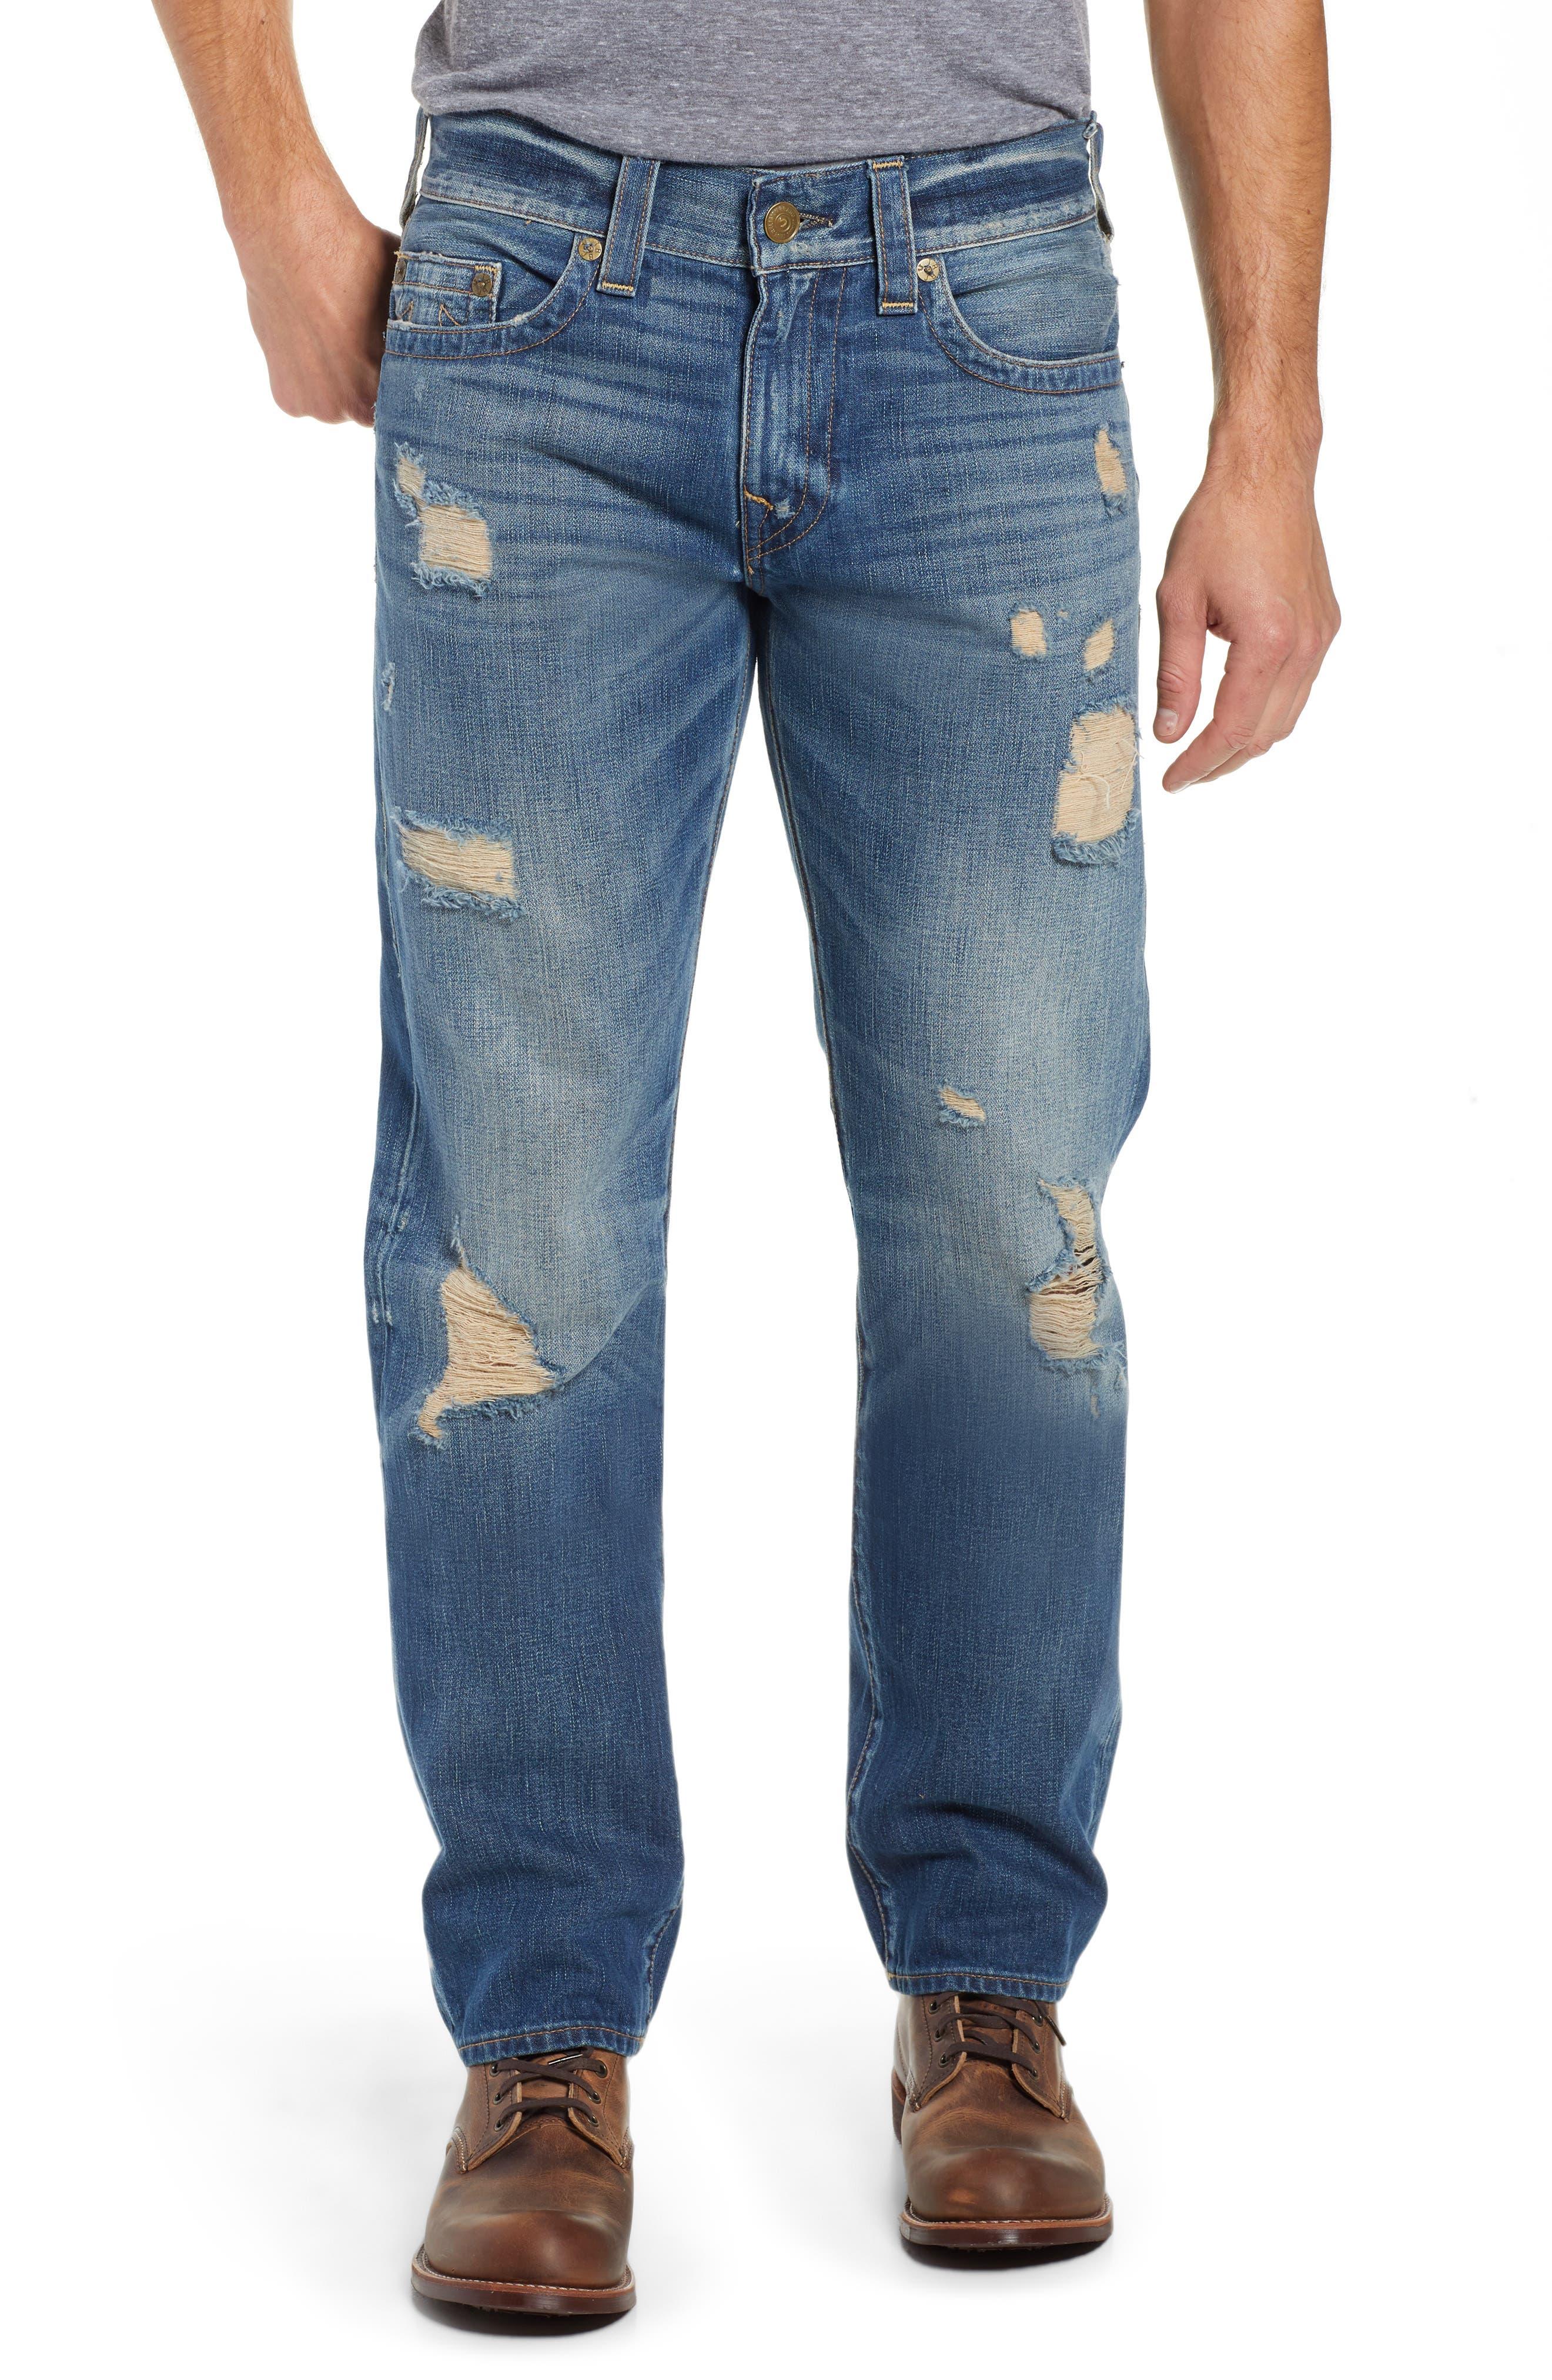 TRUE RELIGION BRAND JEANS Geno Straight Leg Jeans, Main, color, WORN REBEL